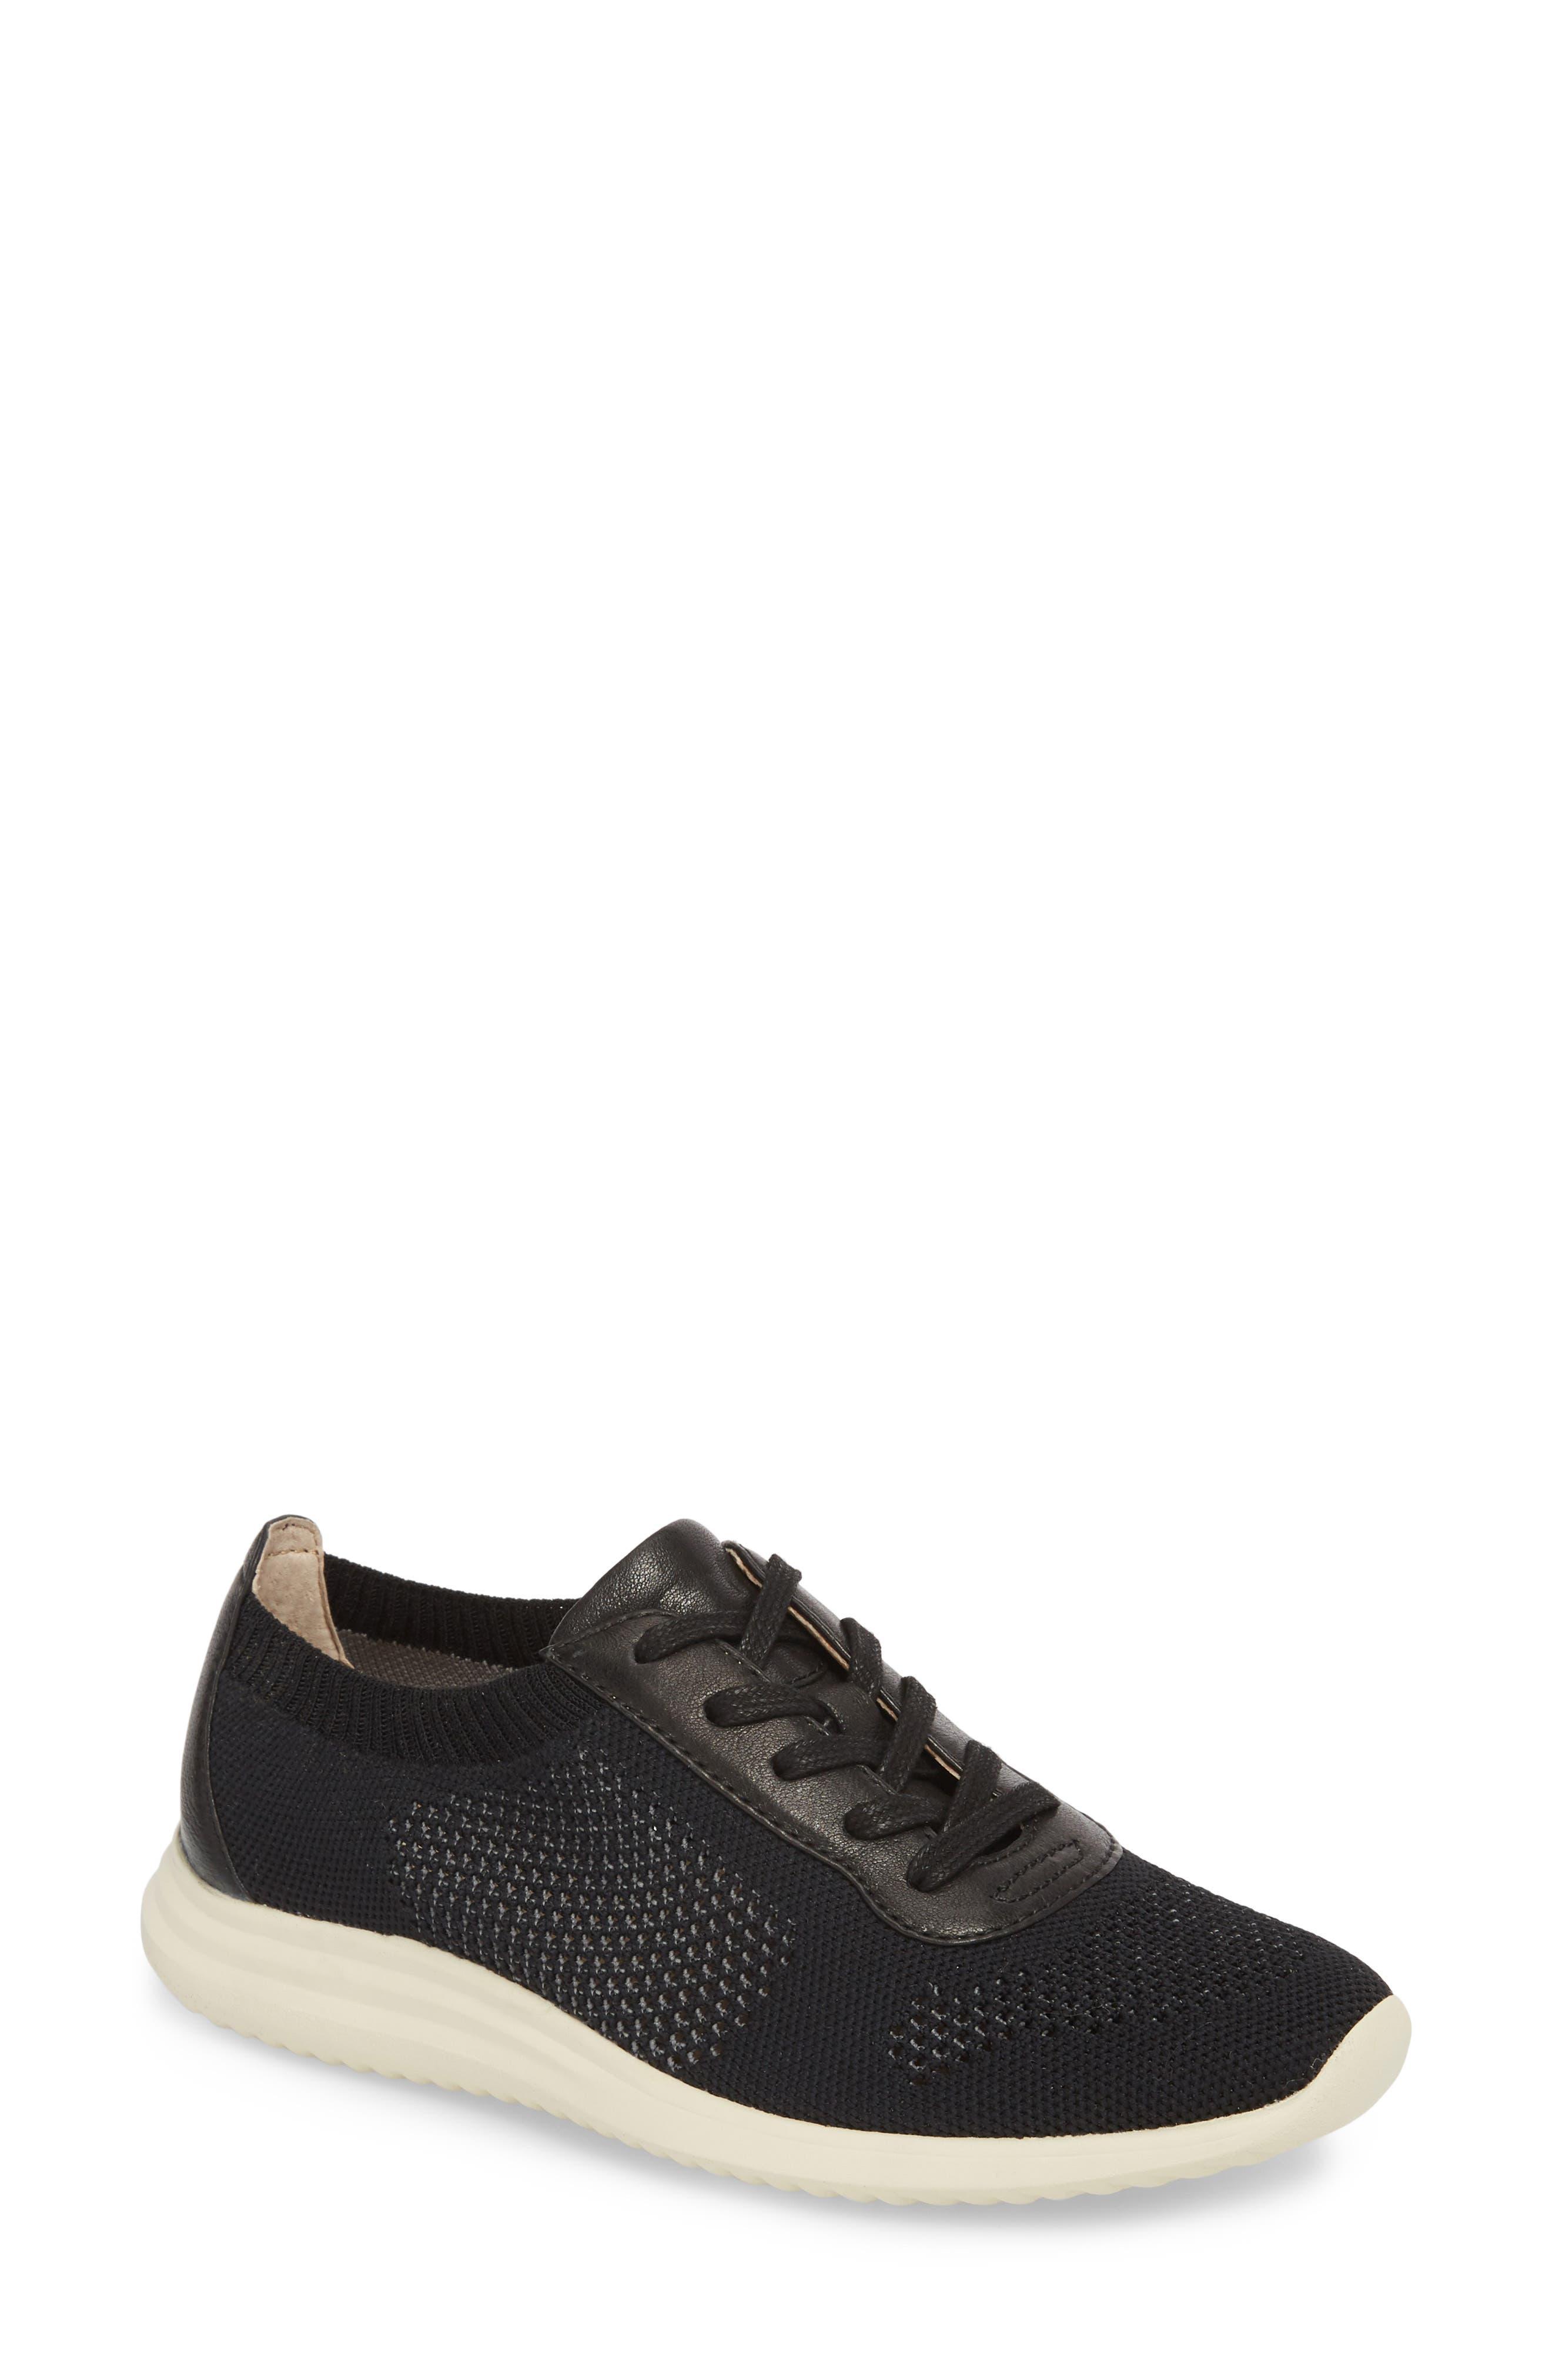 Novella Sneaker,                         Main,                         color, Black Fabric